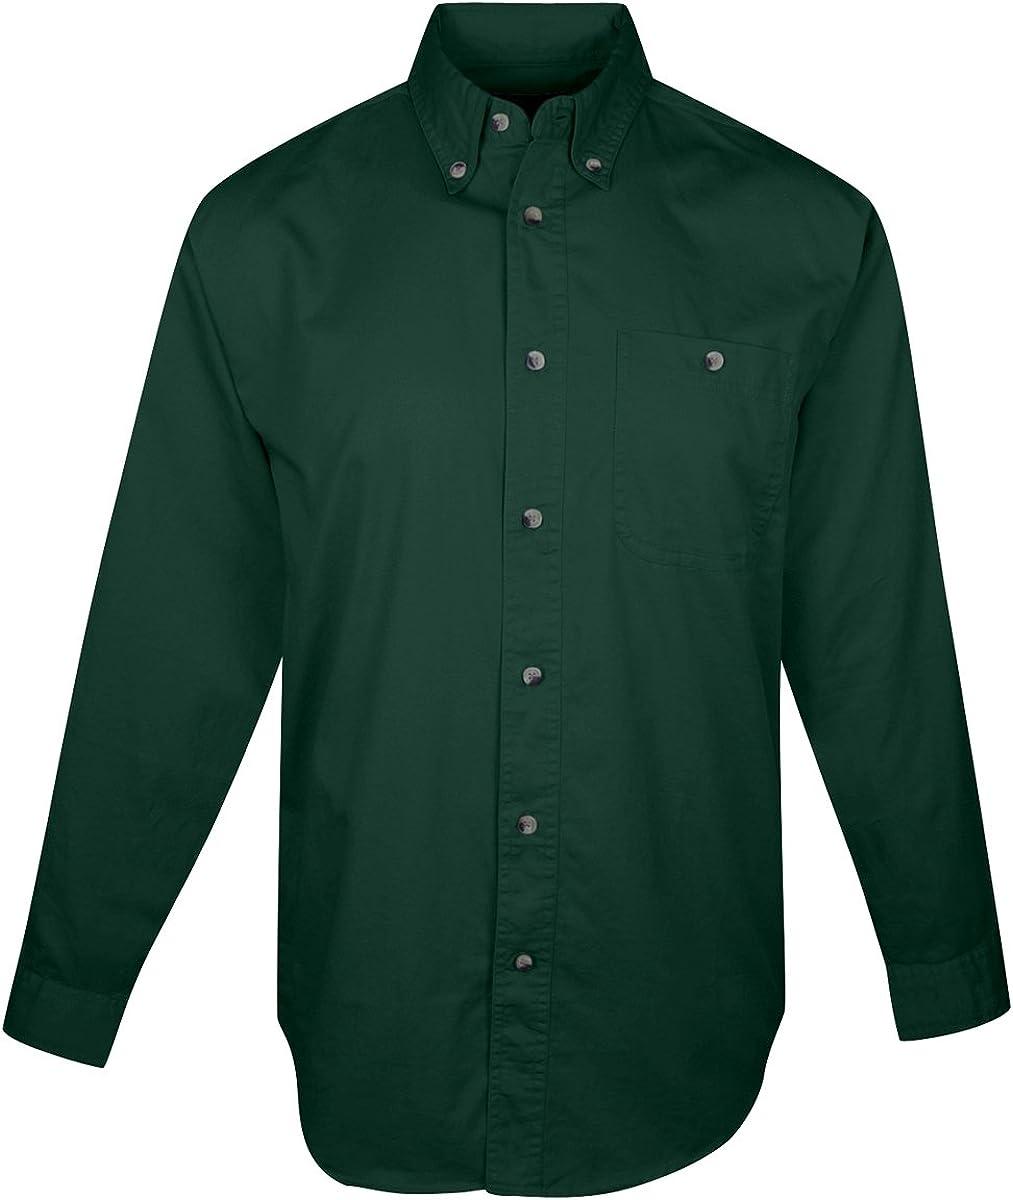 Tri-mountain Mens cotton long sleeve twill shirt. 810TM - FOREST GREEN_4XLT